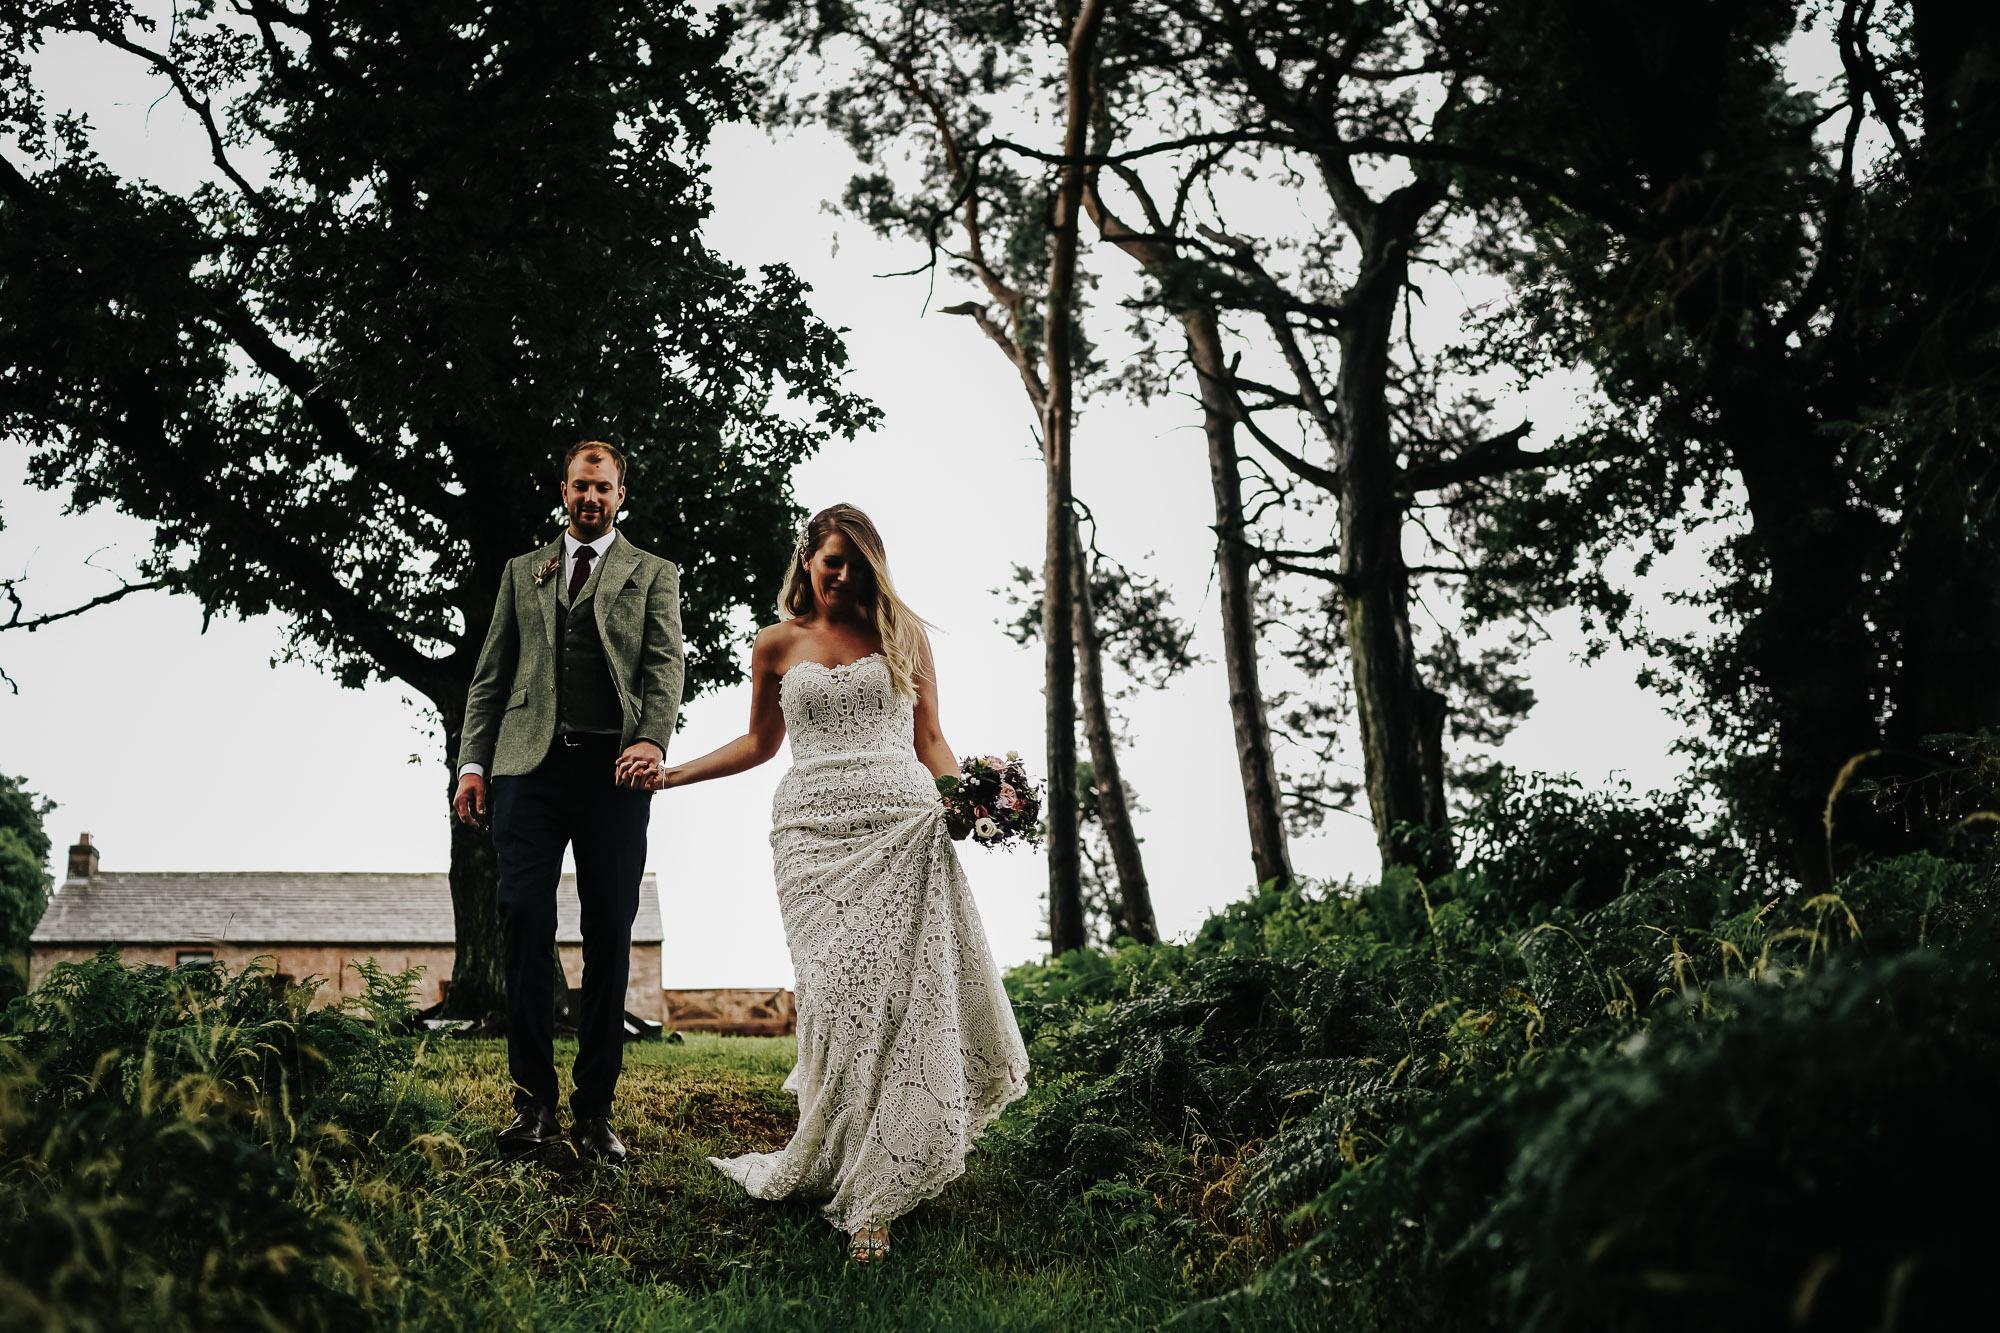 High Barn Wedding photographer lake distect penrith documentry wedding photography (34 of 57).jpg